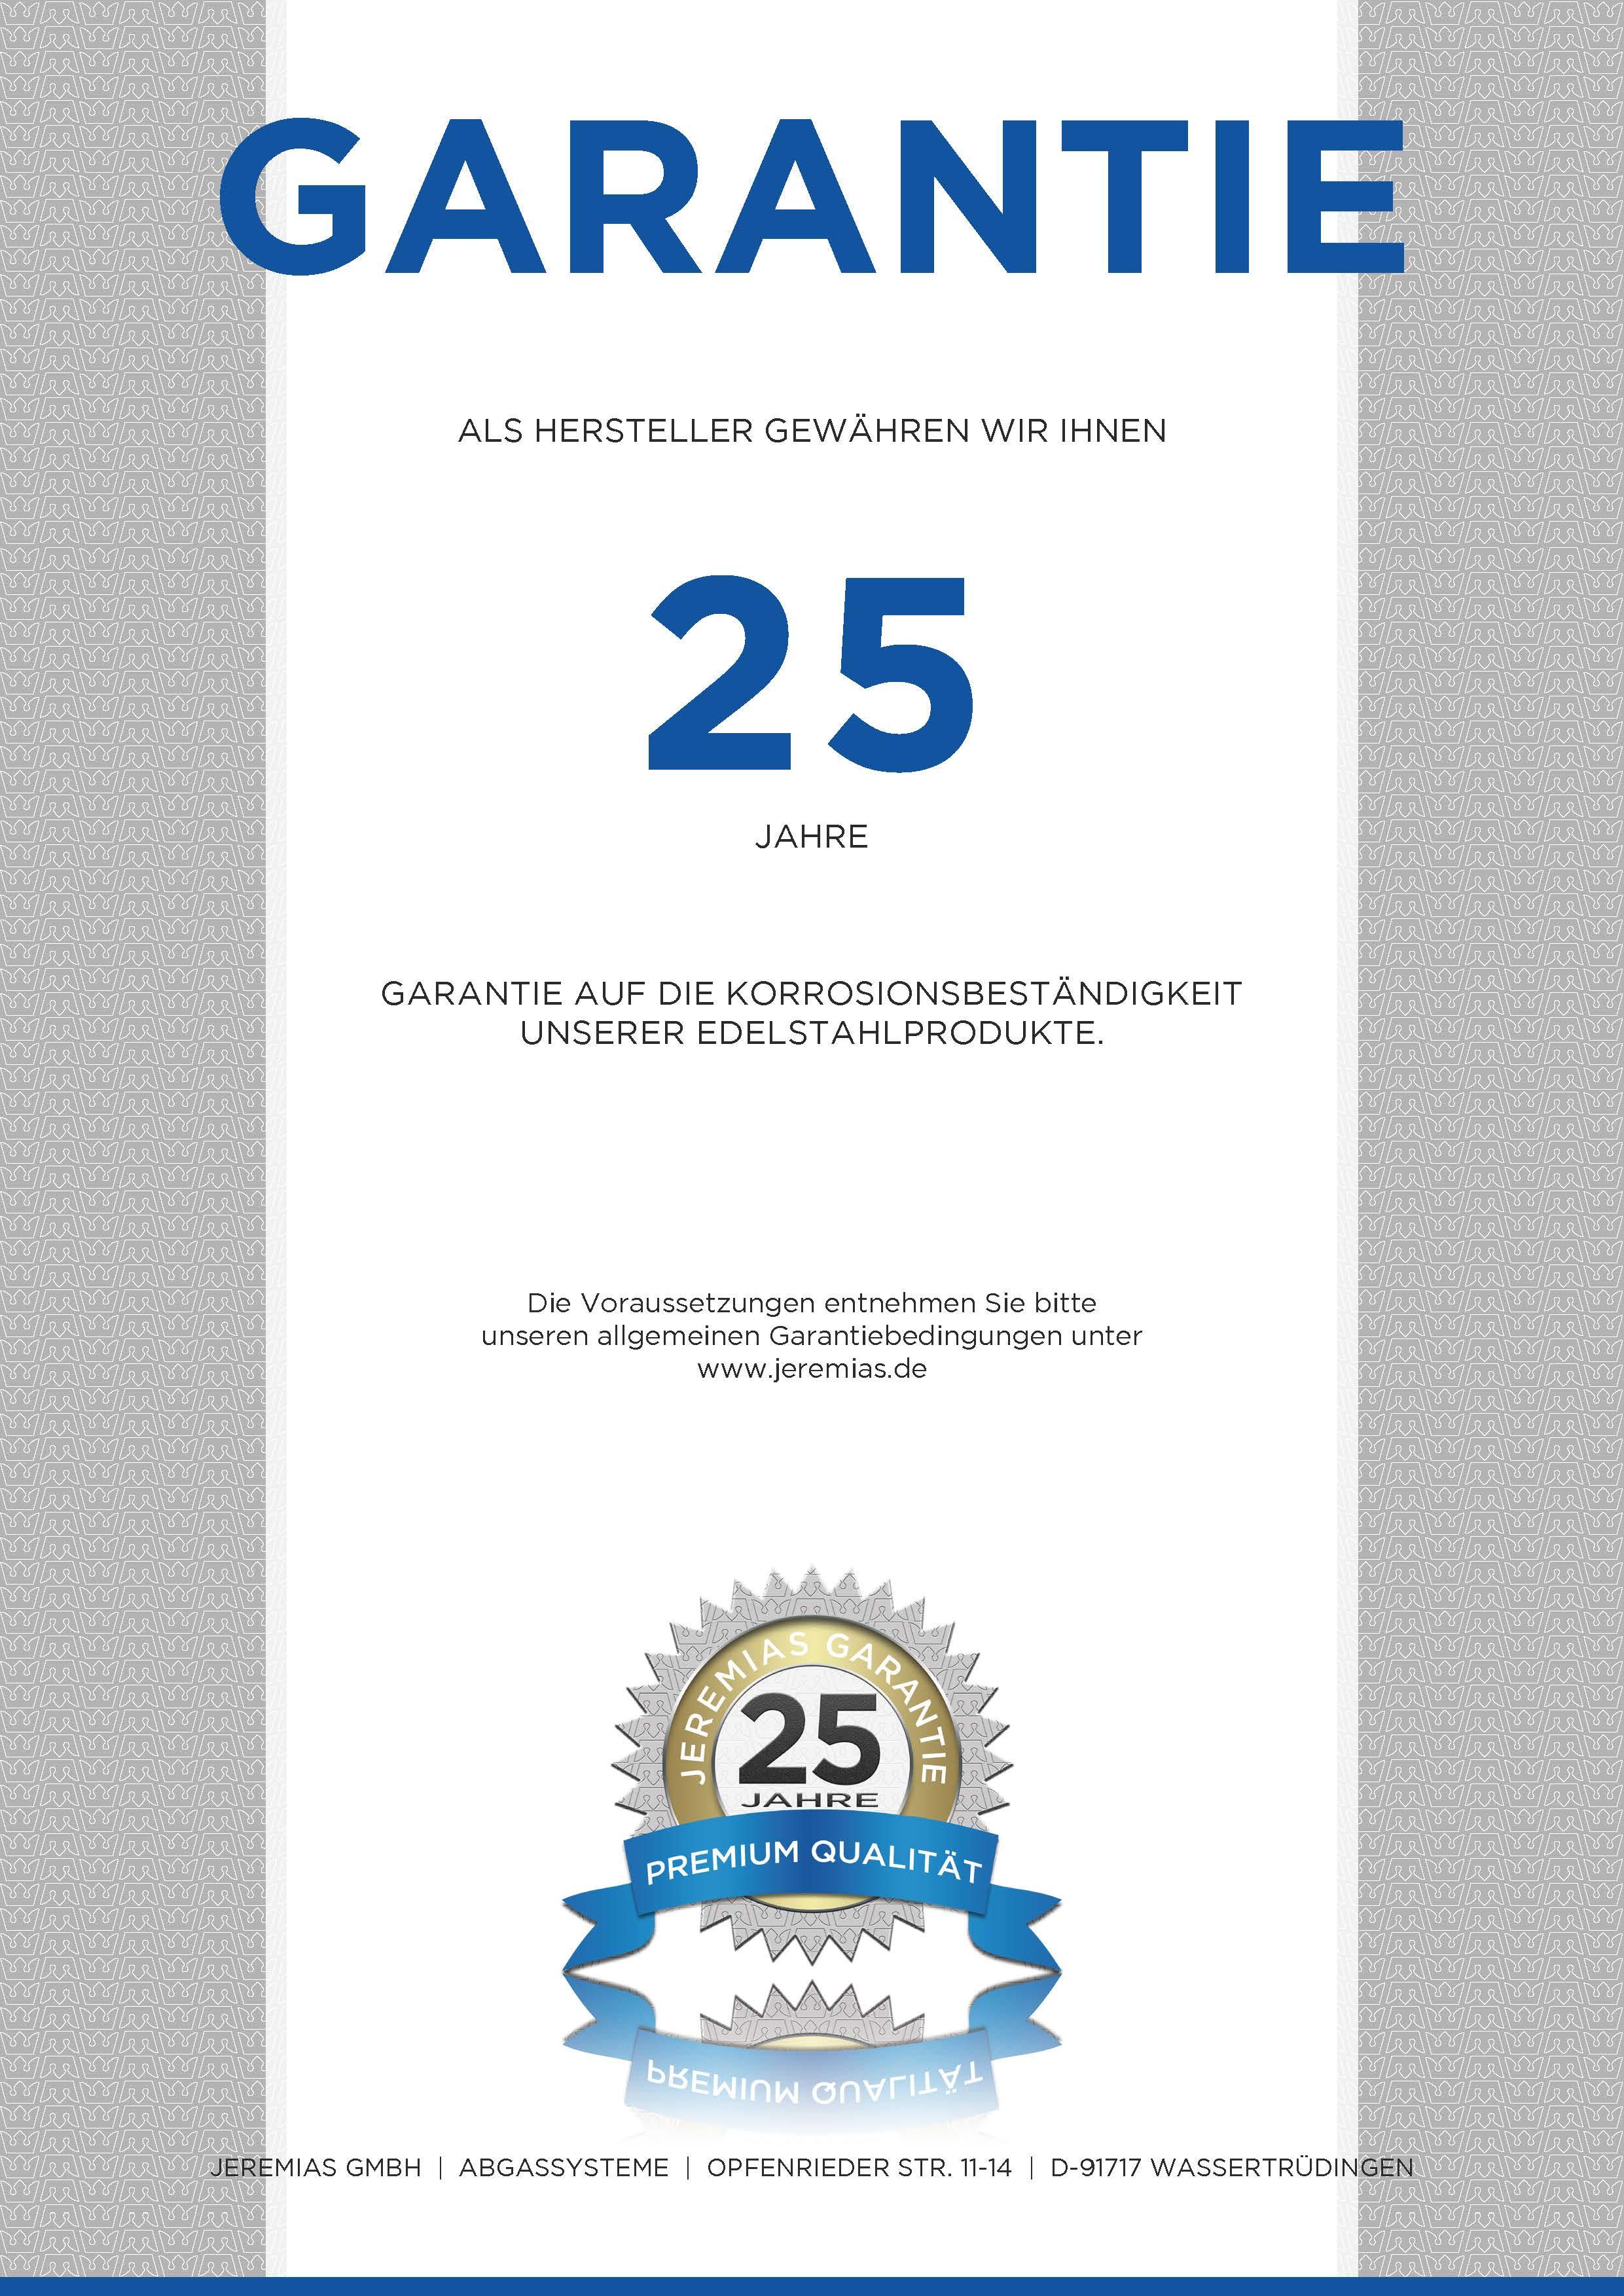 Dwkl Vt Jeremias 174 Exhaust Systems